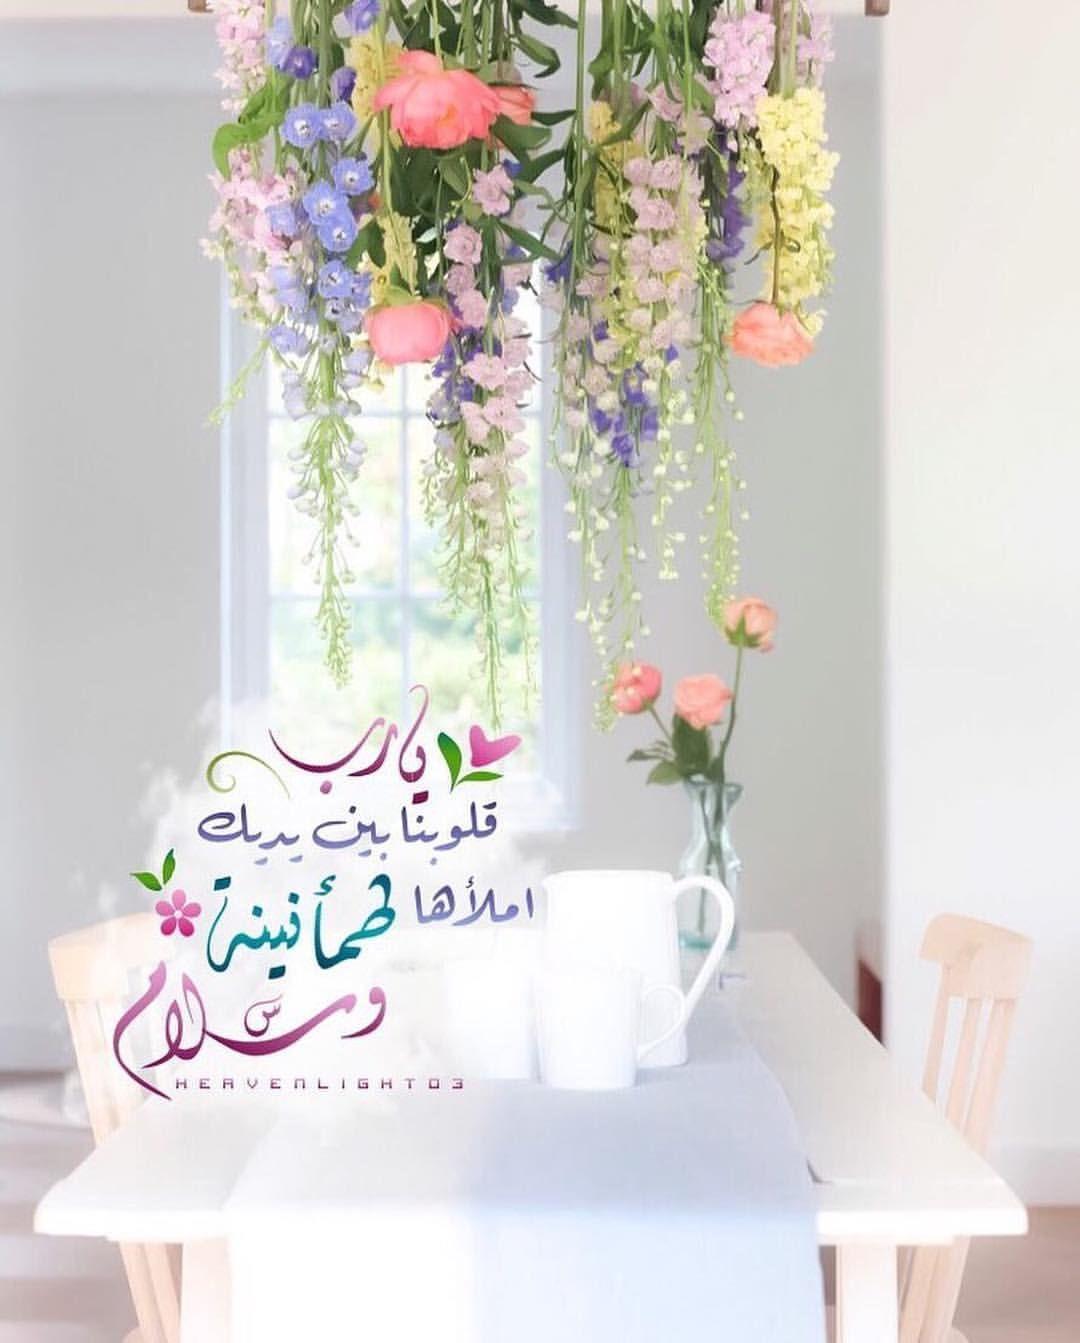 406 Likes 6 Comments نشر التصاميم المدينة المنورة 1 Athkar On Instagram لنشر تصاميمكم المميزة ضع ت Islamic Pictures Home Decor Decals Glass Vase